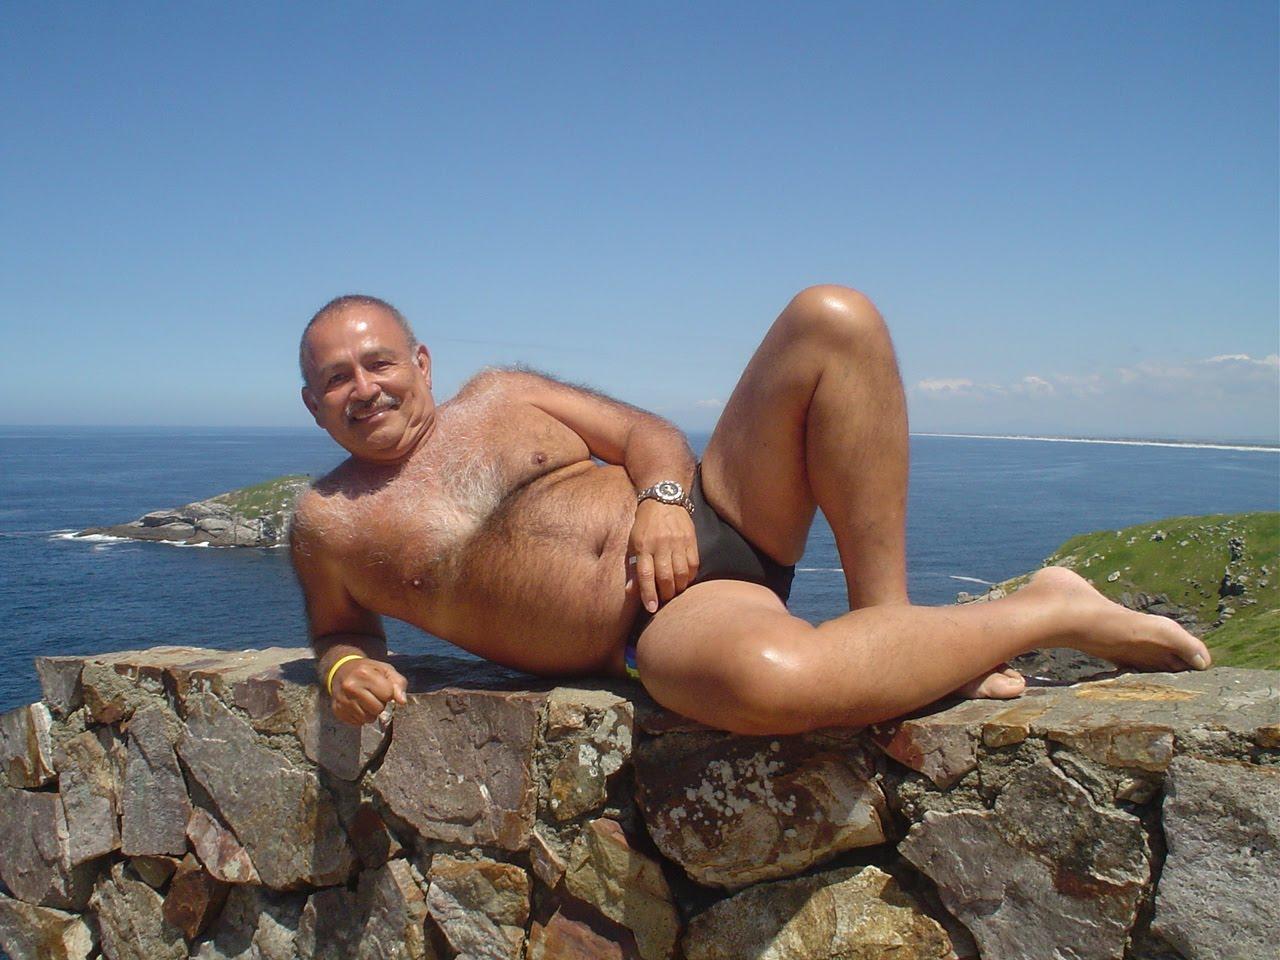 Gay Maduros Blog 13